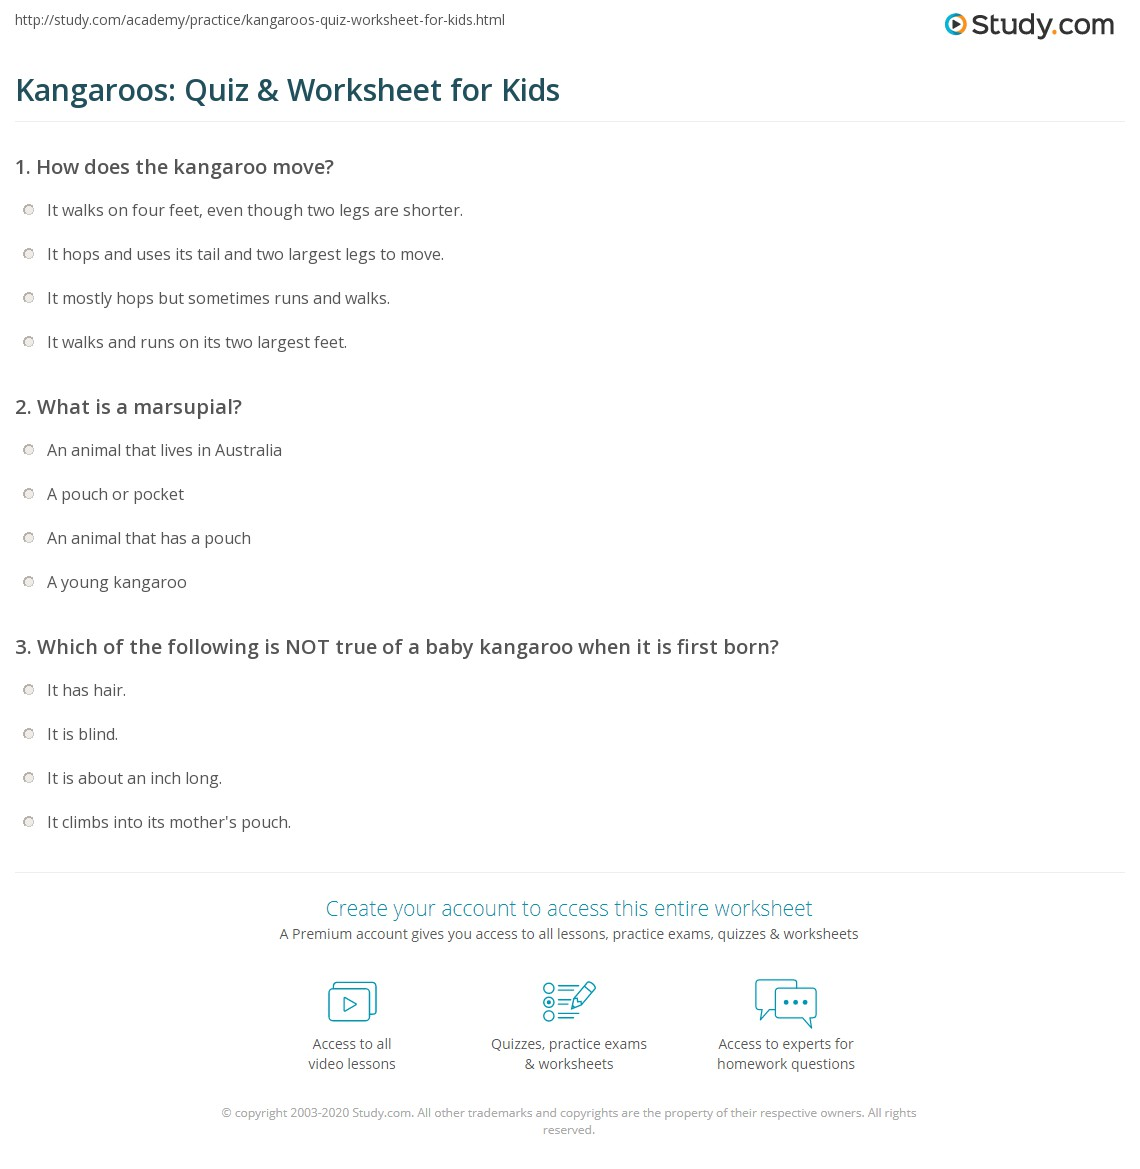 Kangaroos: Quiz & Worksheet for Kids | Study.com